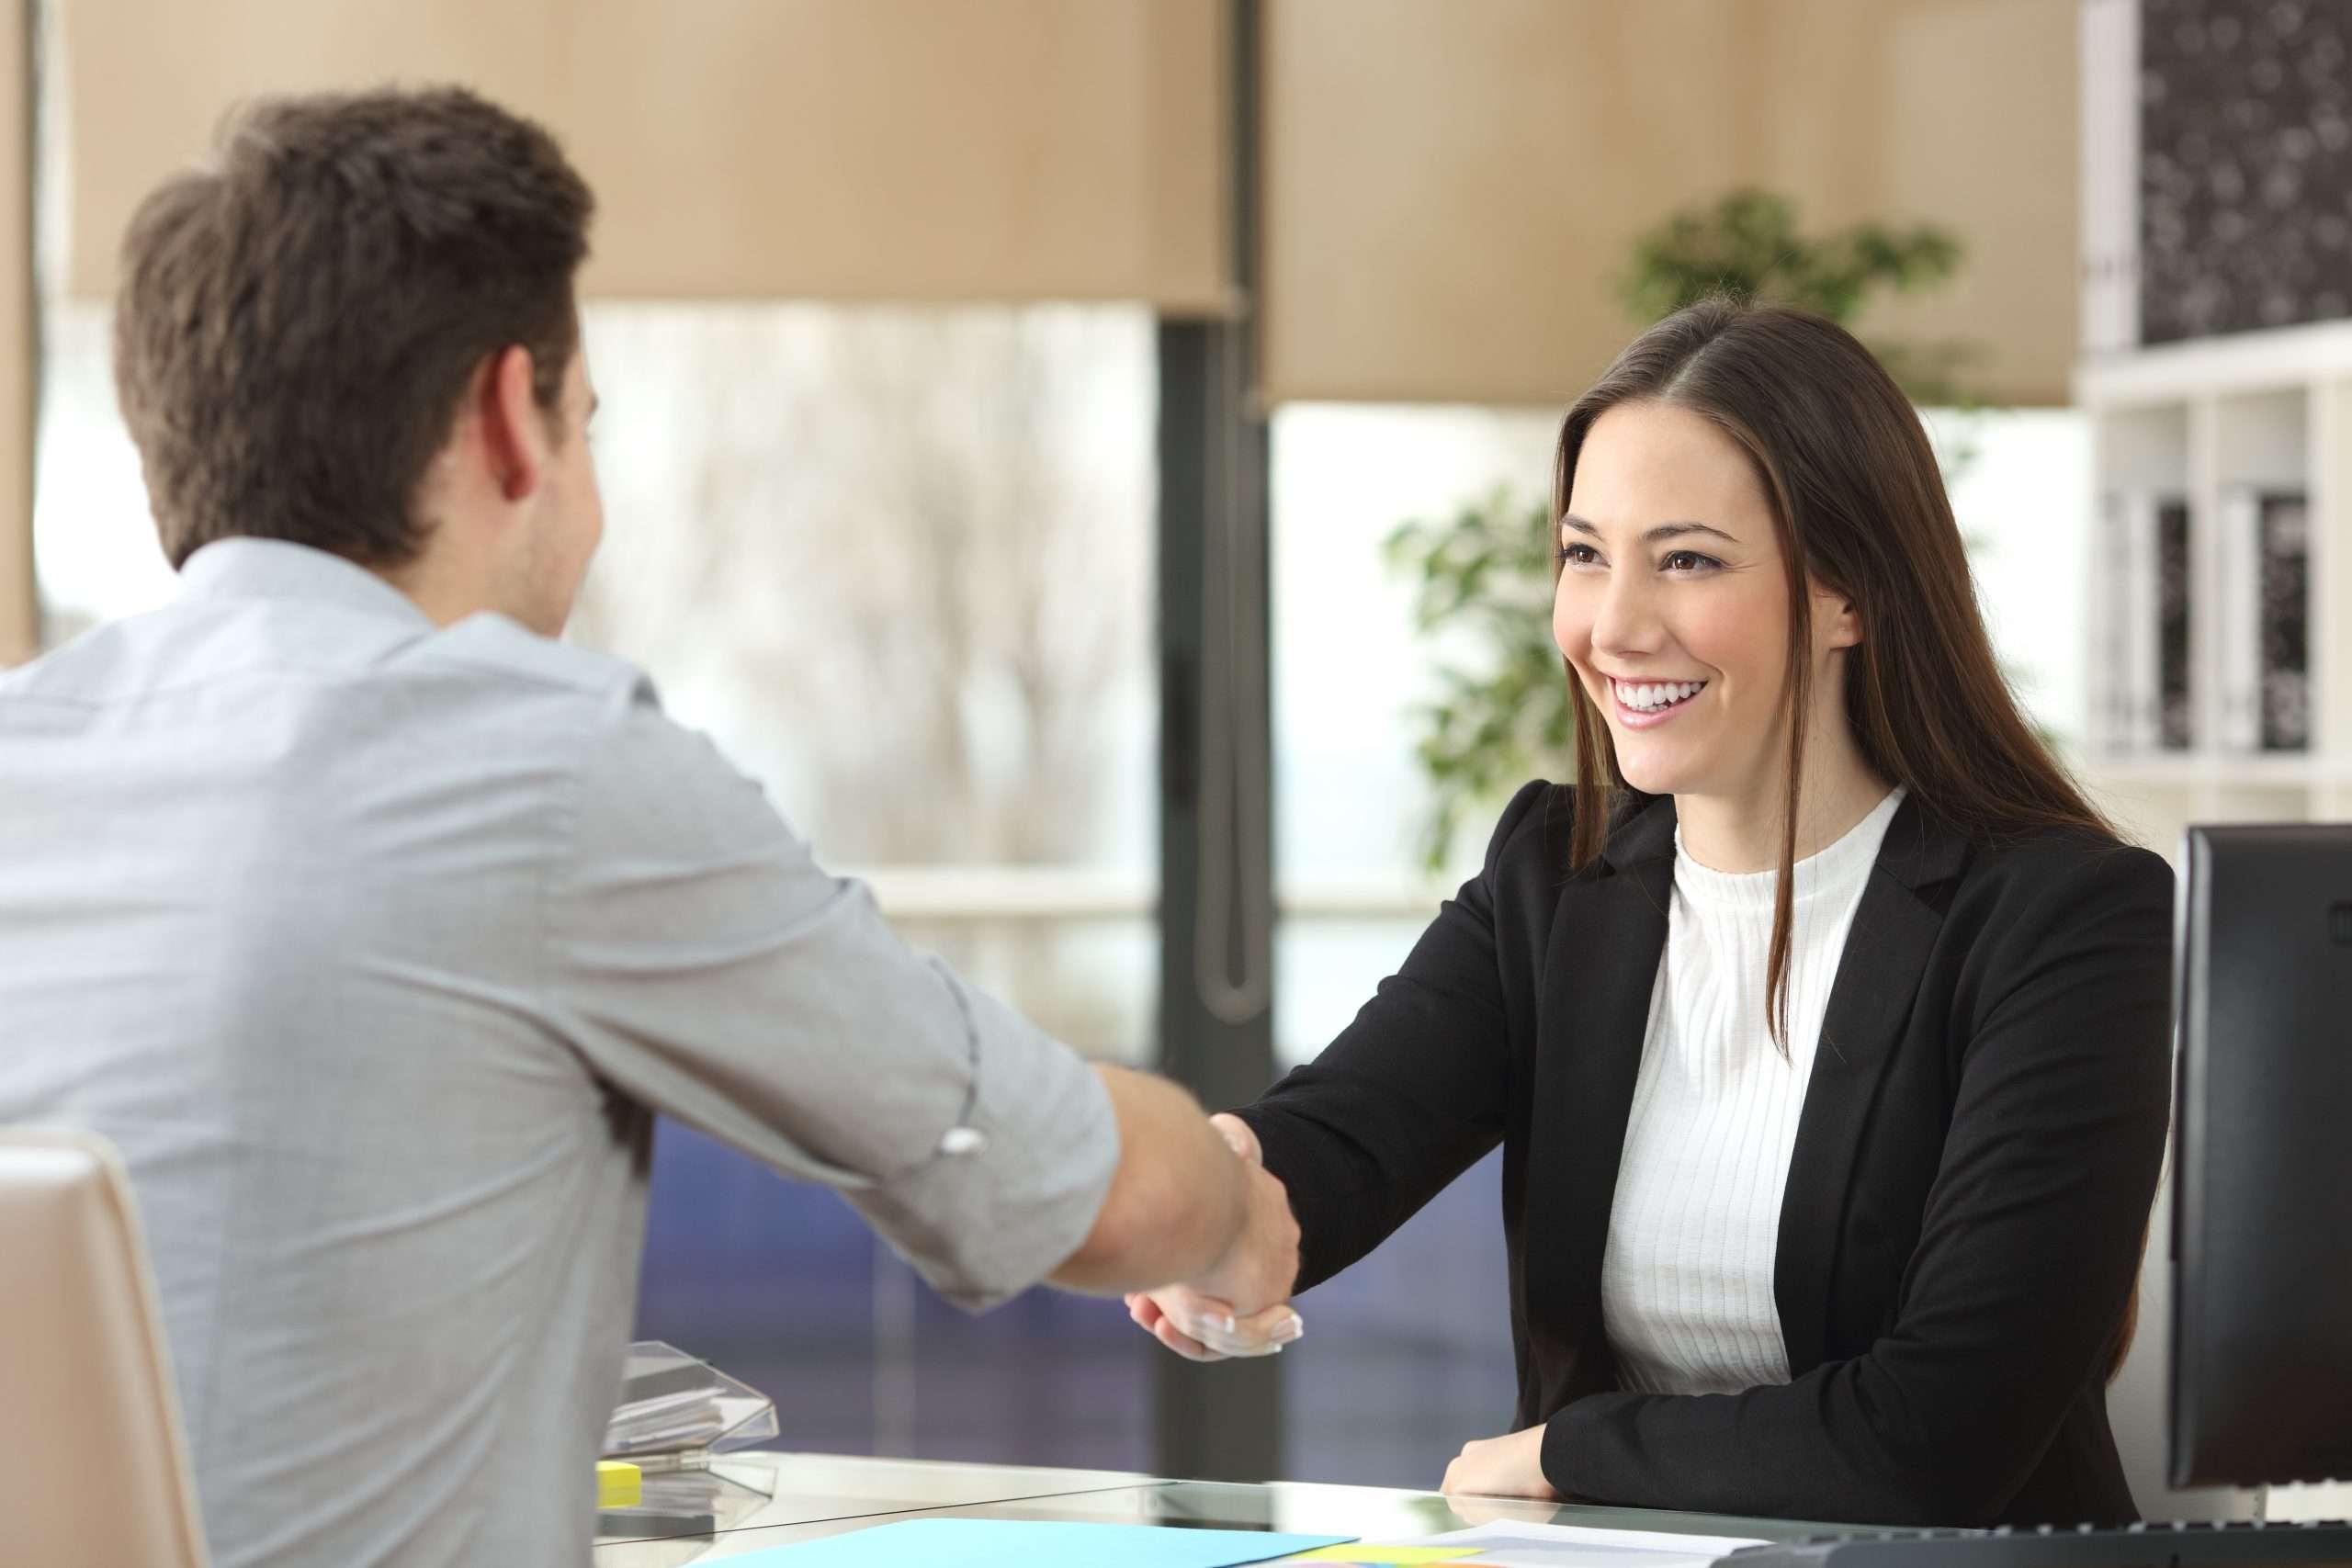 An entrepreneur applies for an SBA loan for her startup venture.